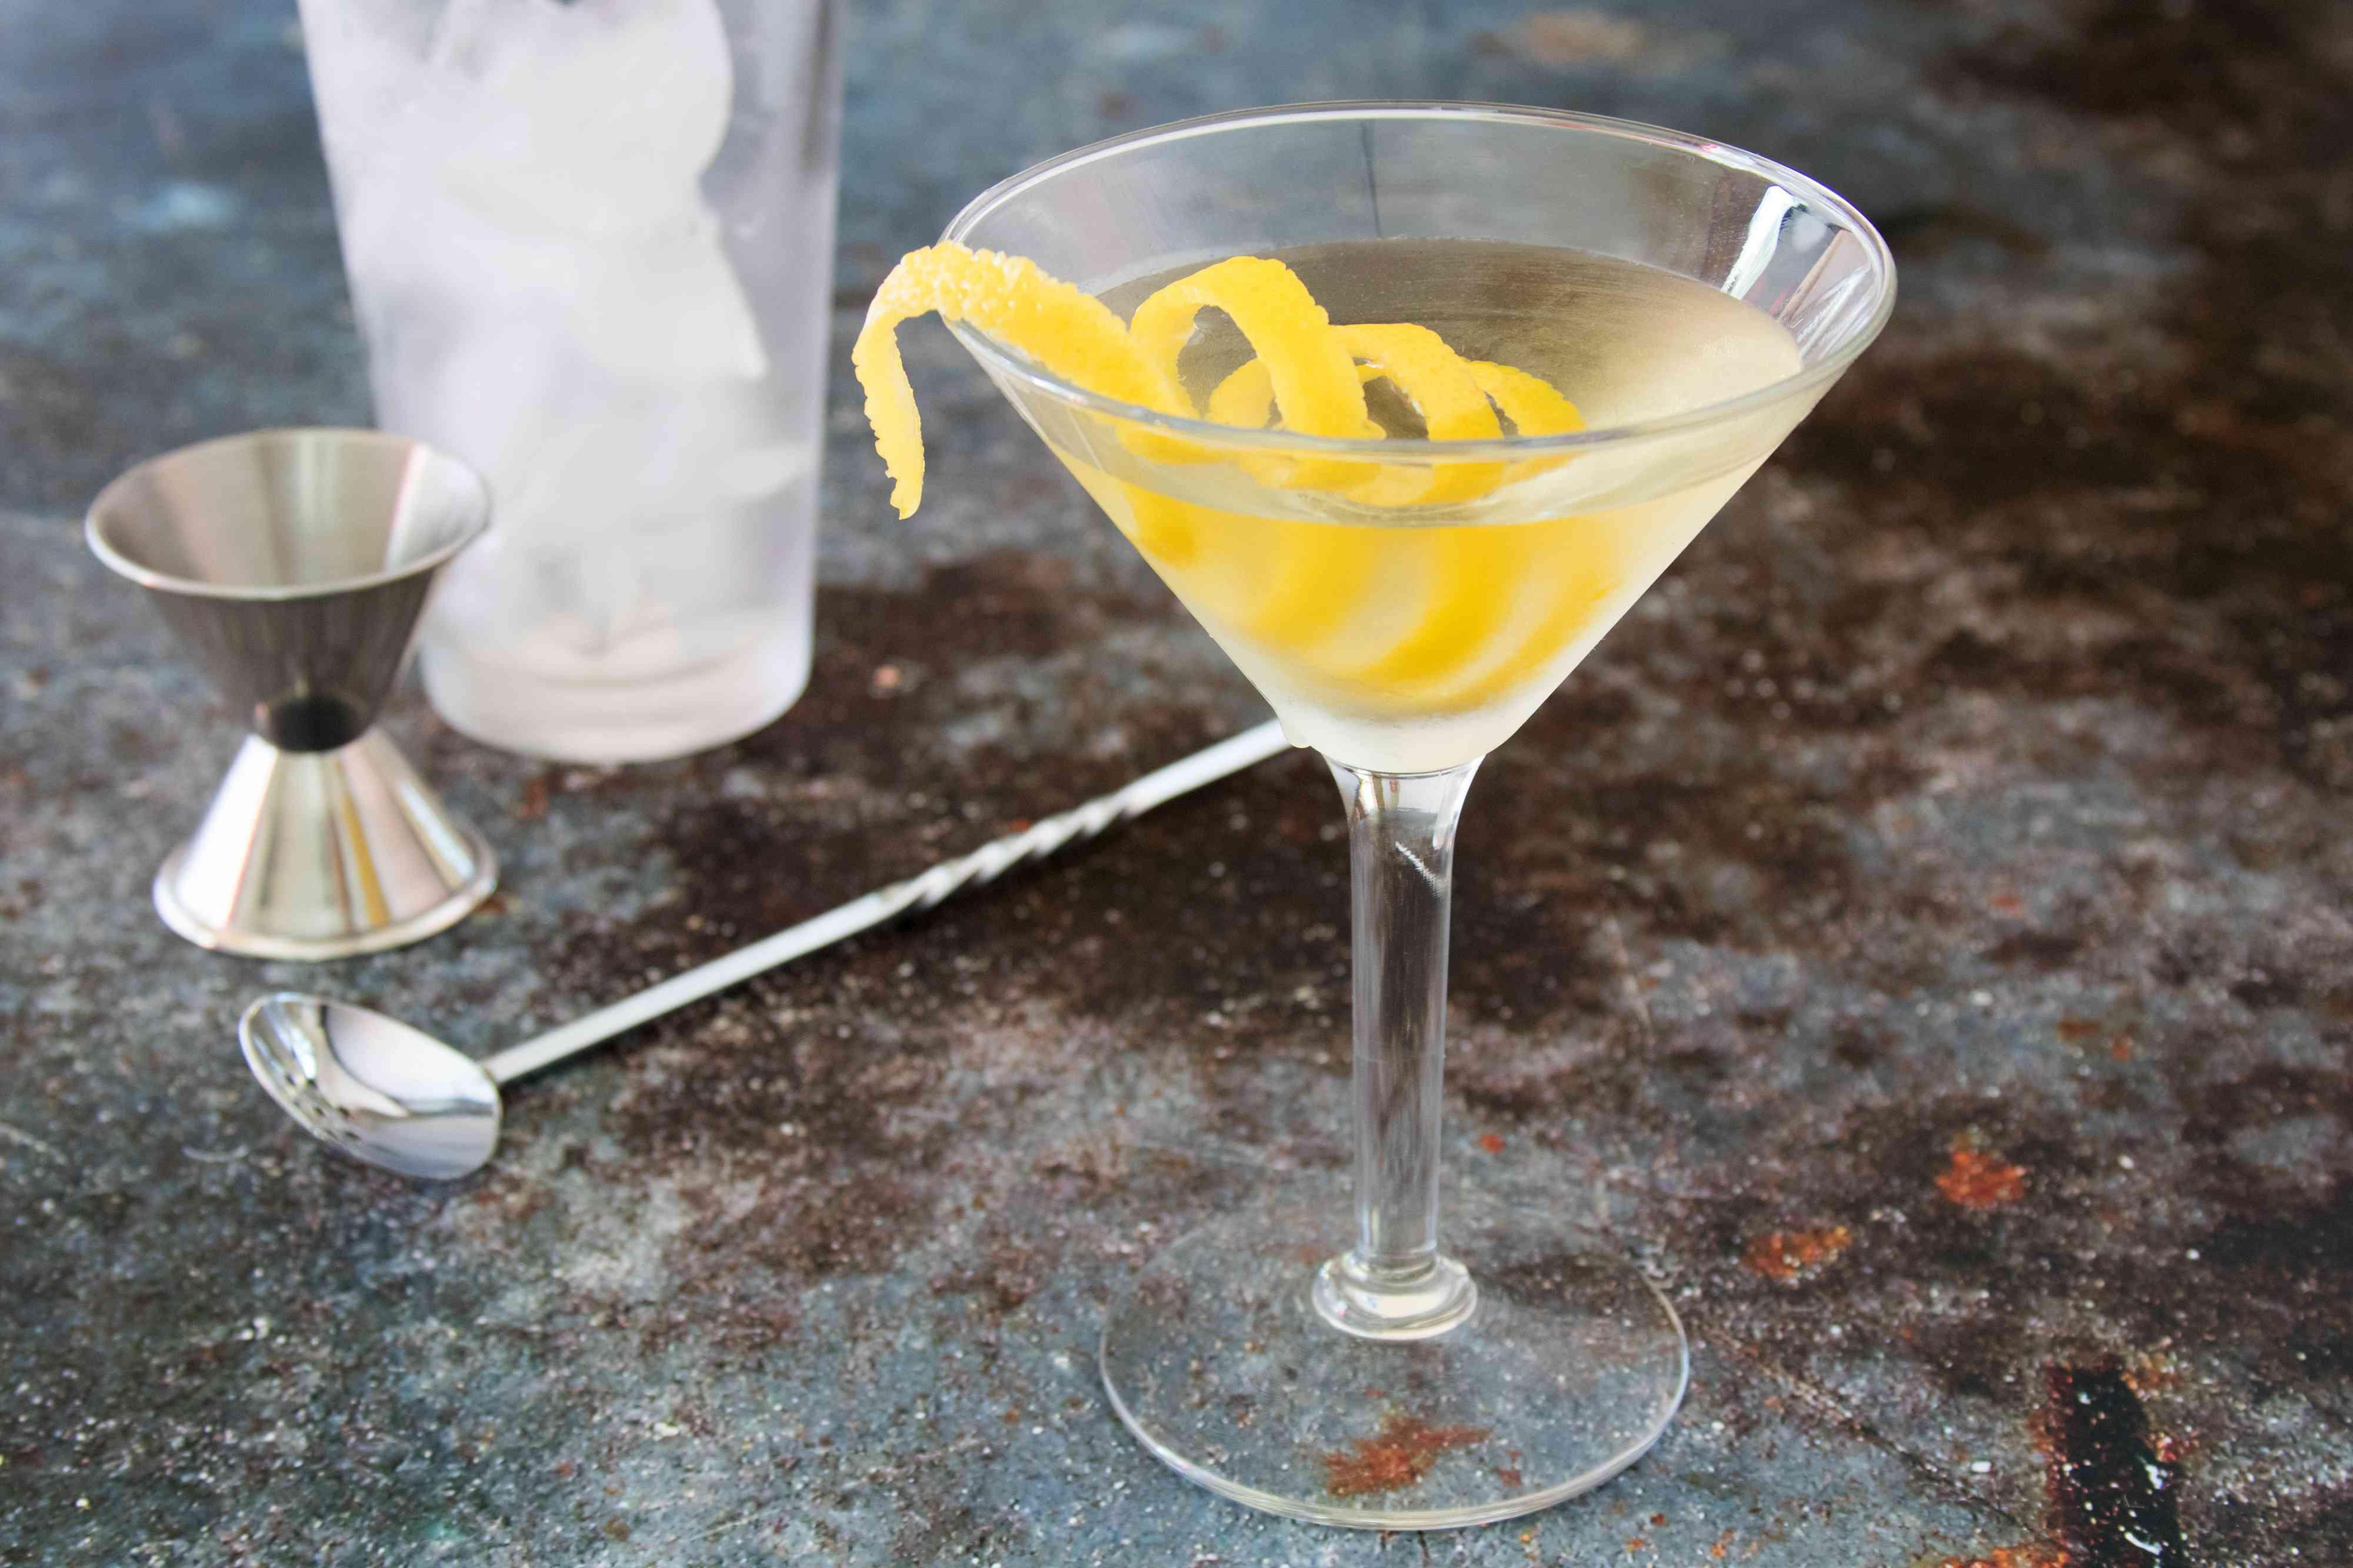 Smoky Martini With a Lemon Twist